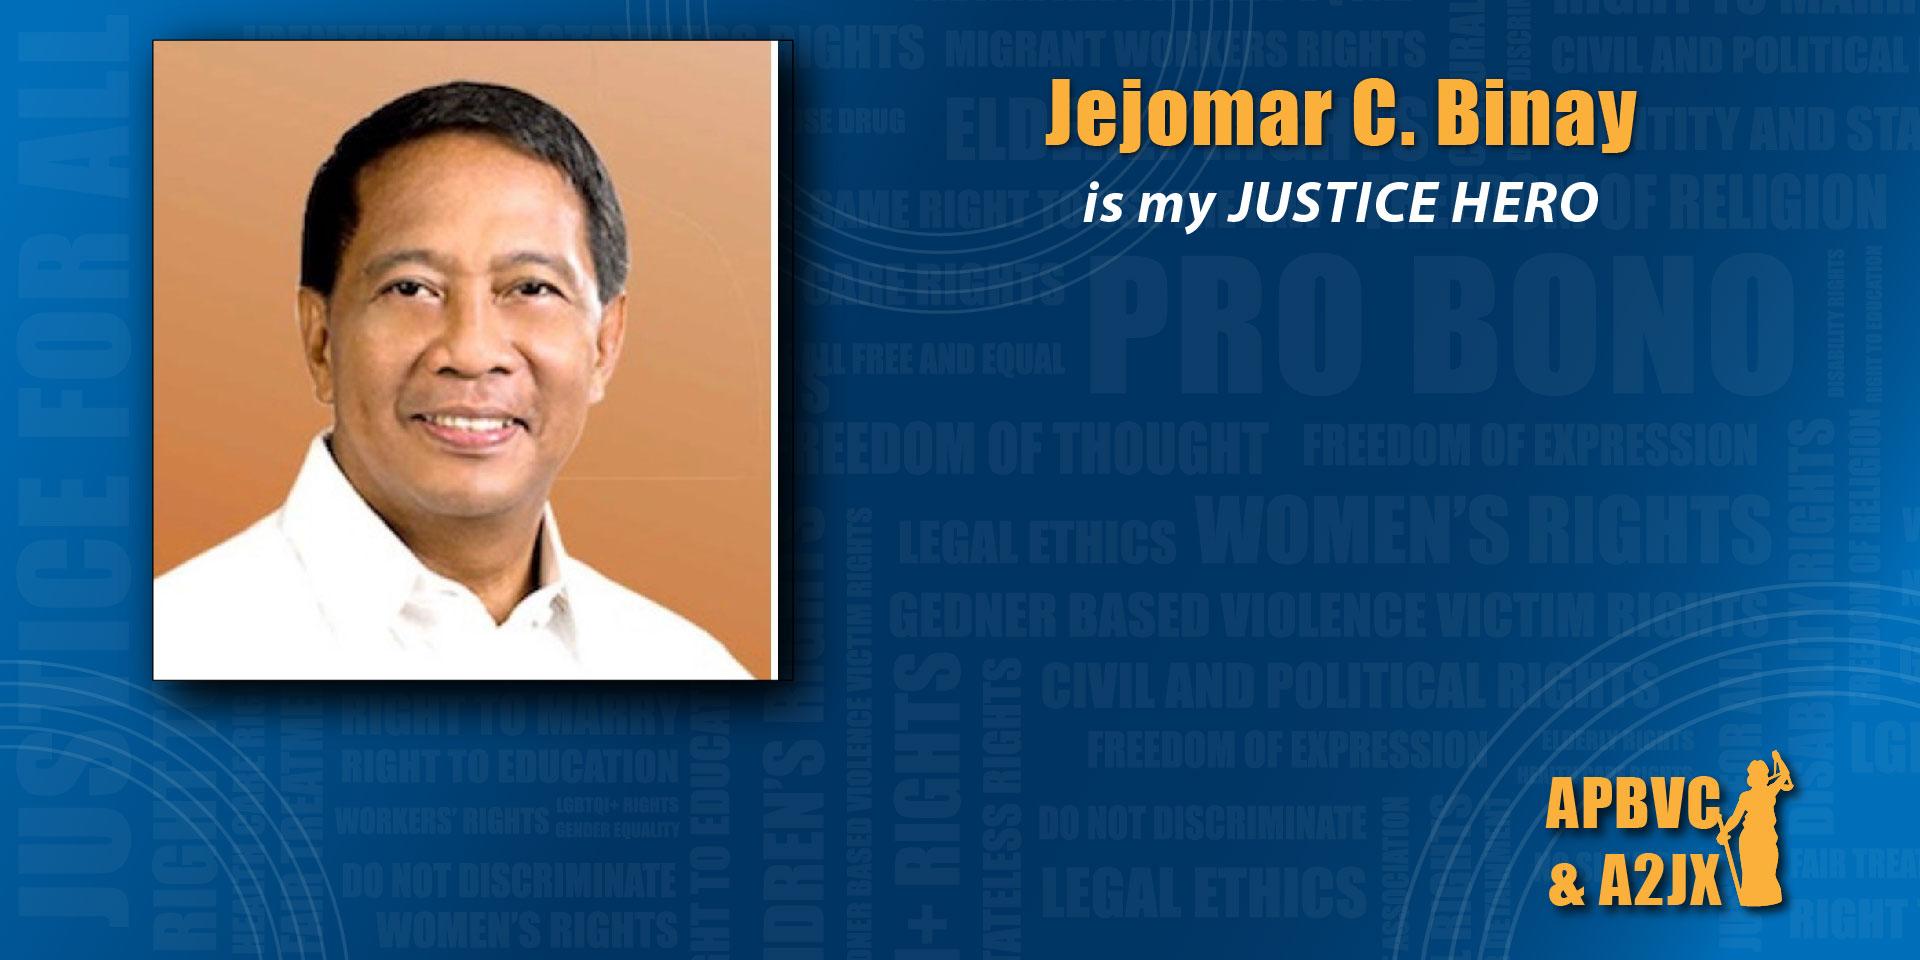 Jejomar C. Binay